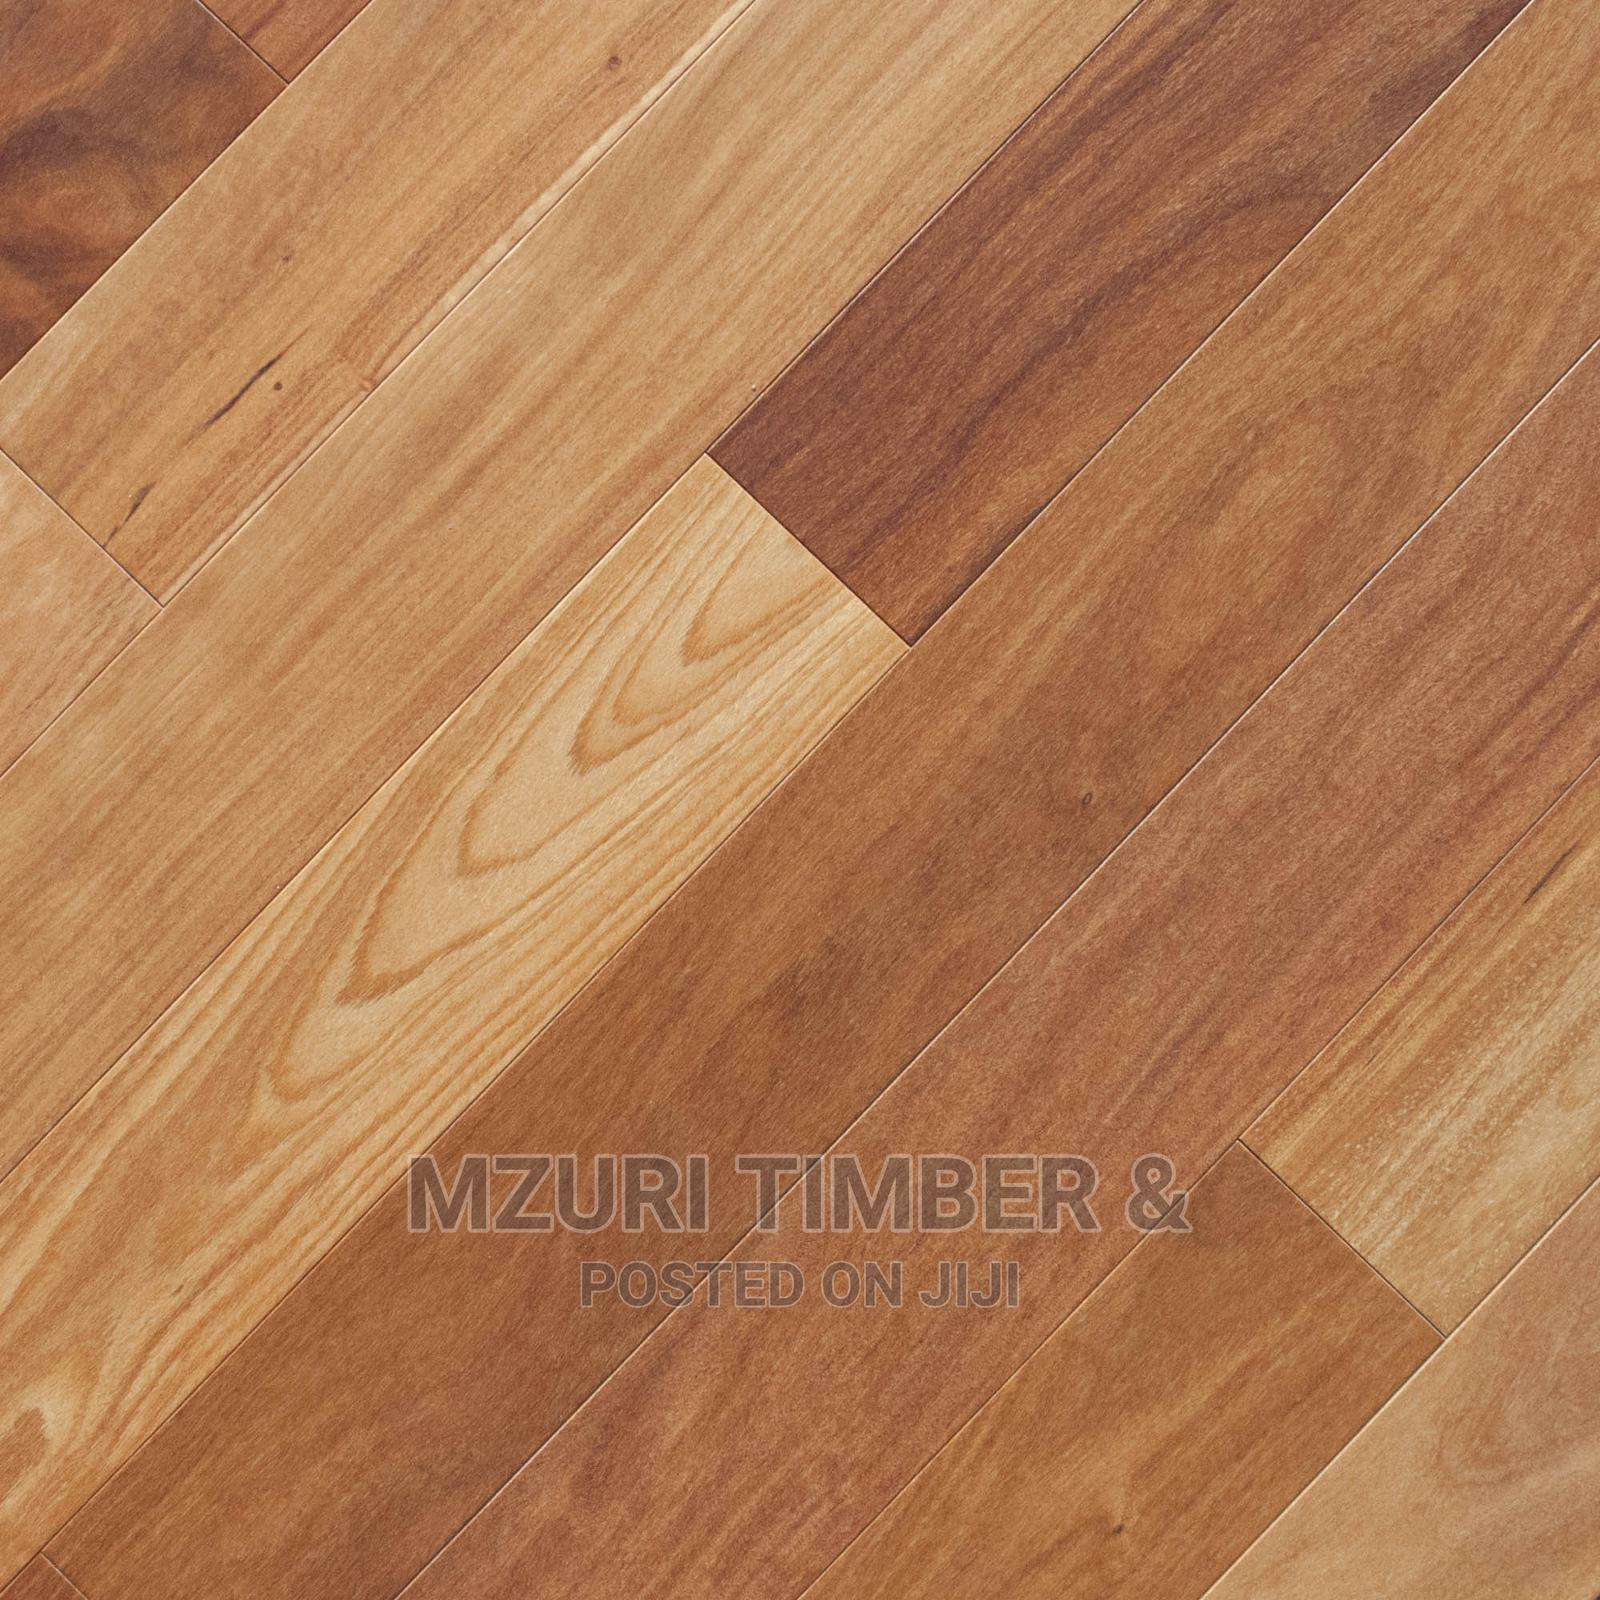 Mahogany Wooden Floor Tiles | Building Materials for sale in Ruiru, Kiambu, Kenya